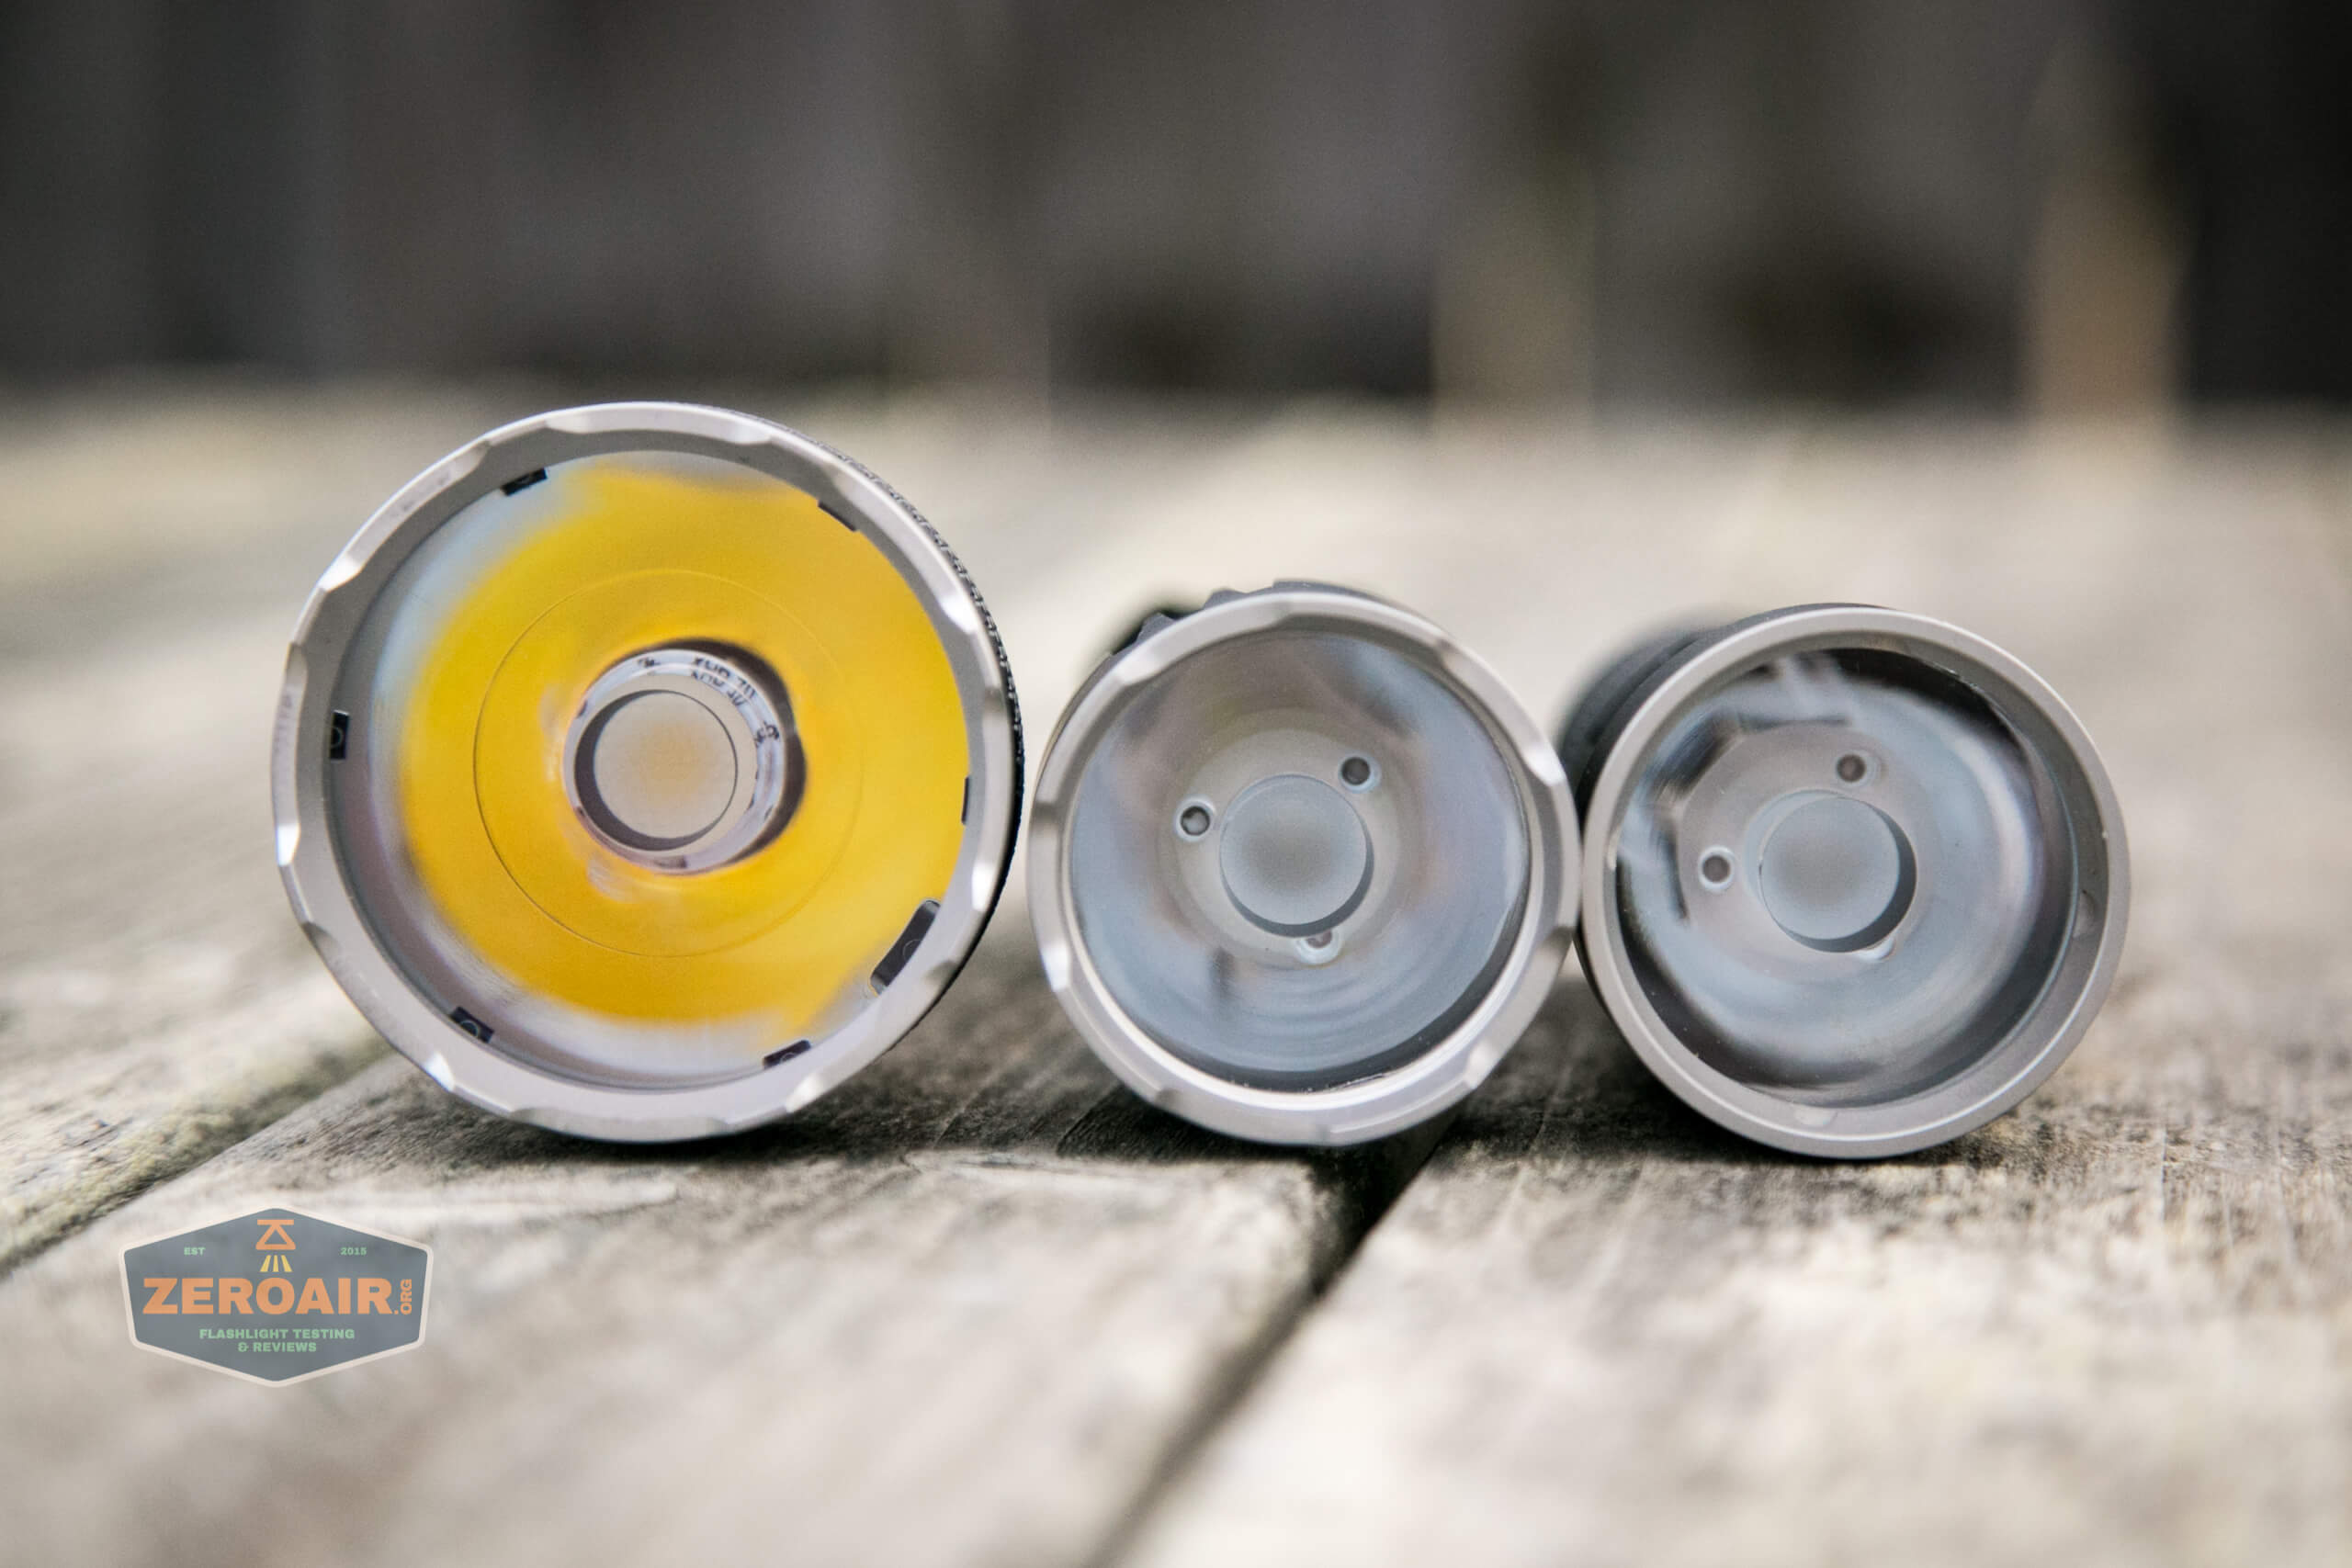 Acebeam L35 brightest tactical flashlight beside other acebeam flashlights